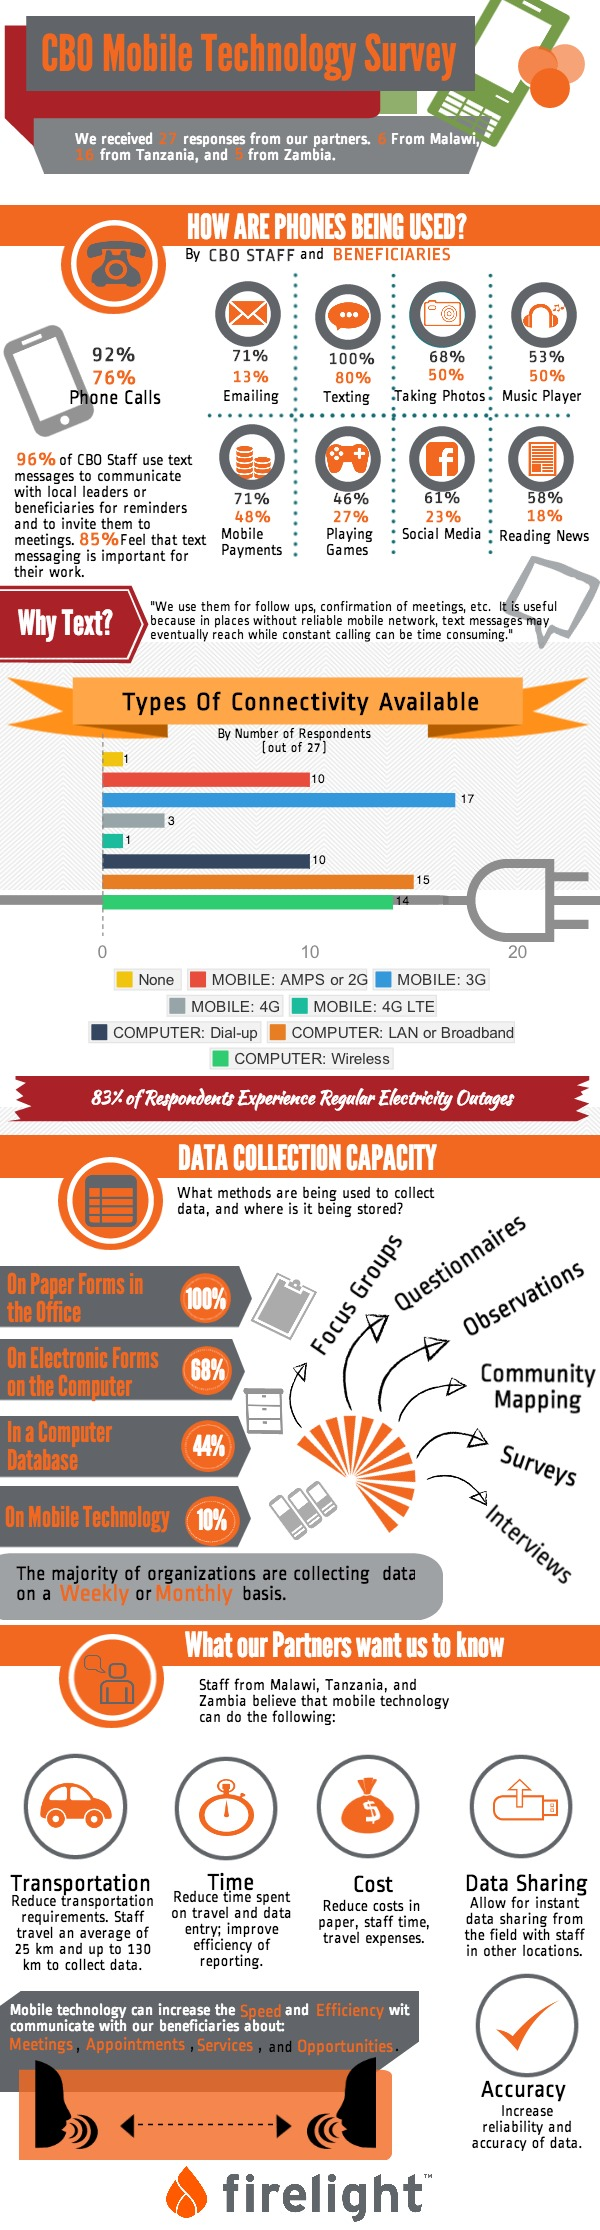 Infographic of survey responses